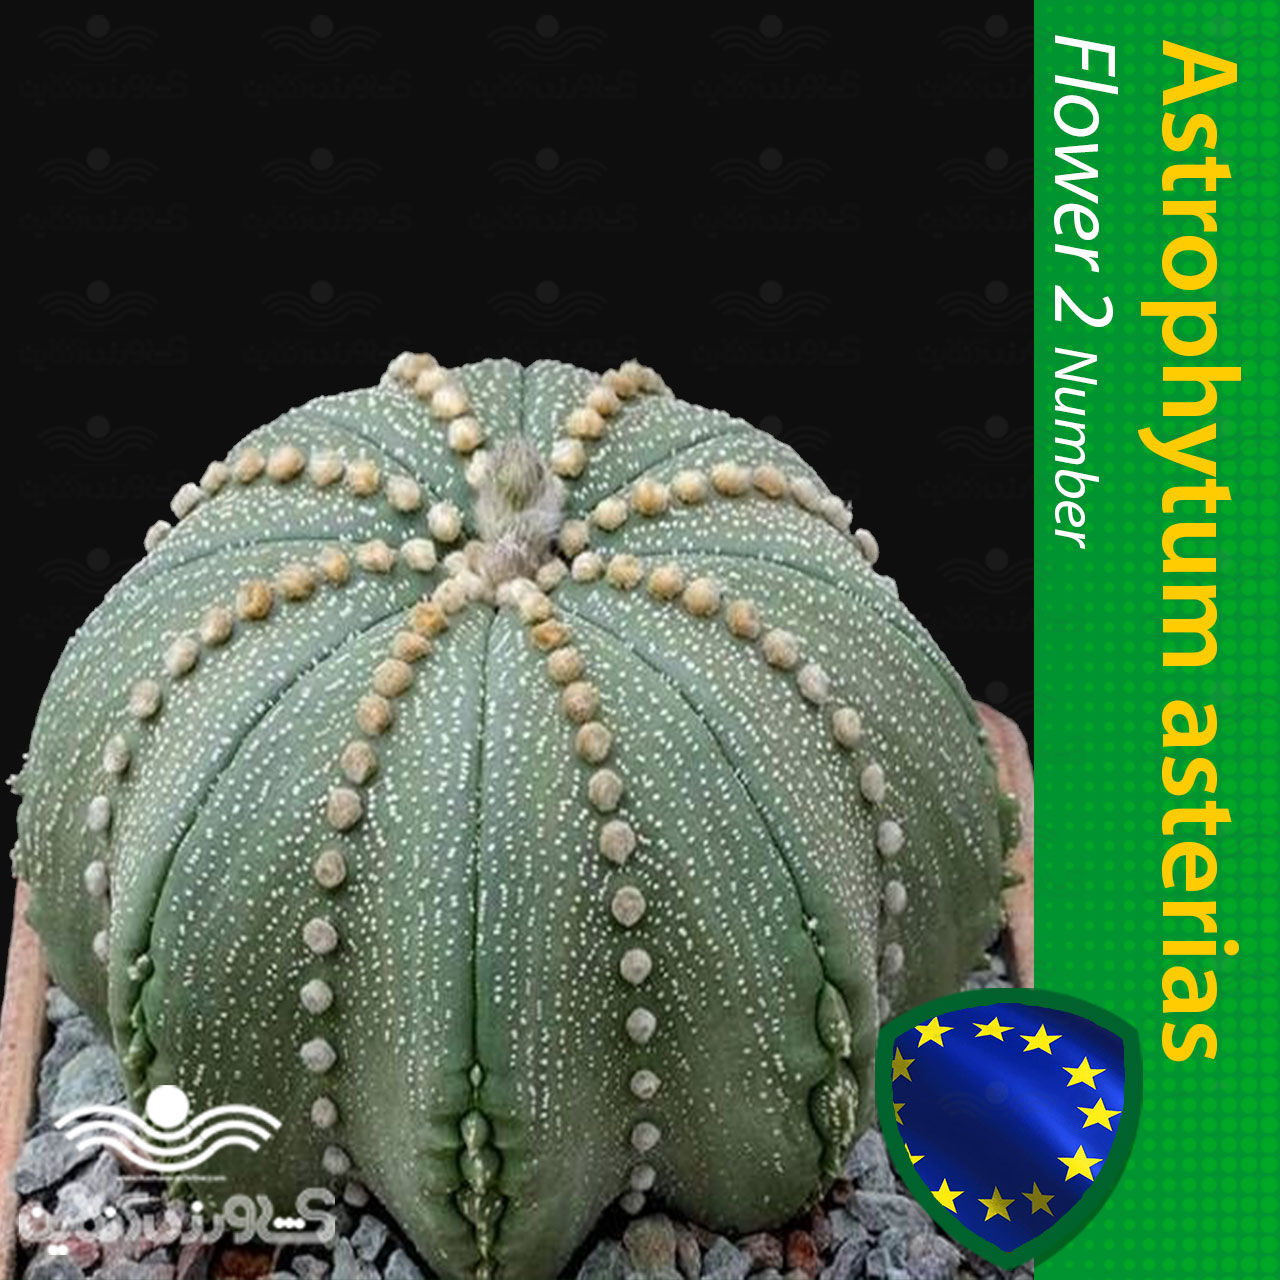 بذرکاکتوس آستریاس لاین آریول